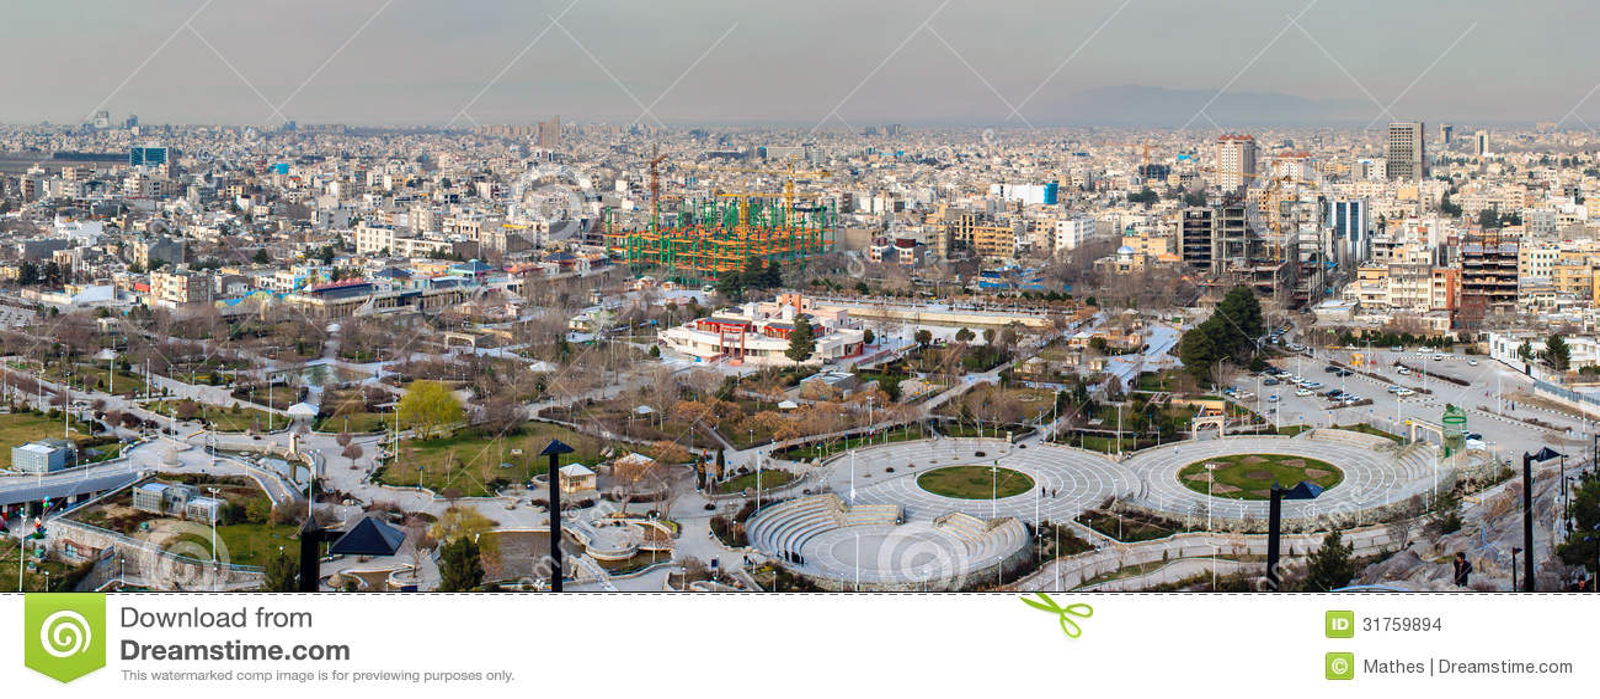 Aerial view of Mashhad